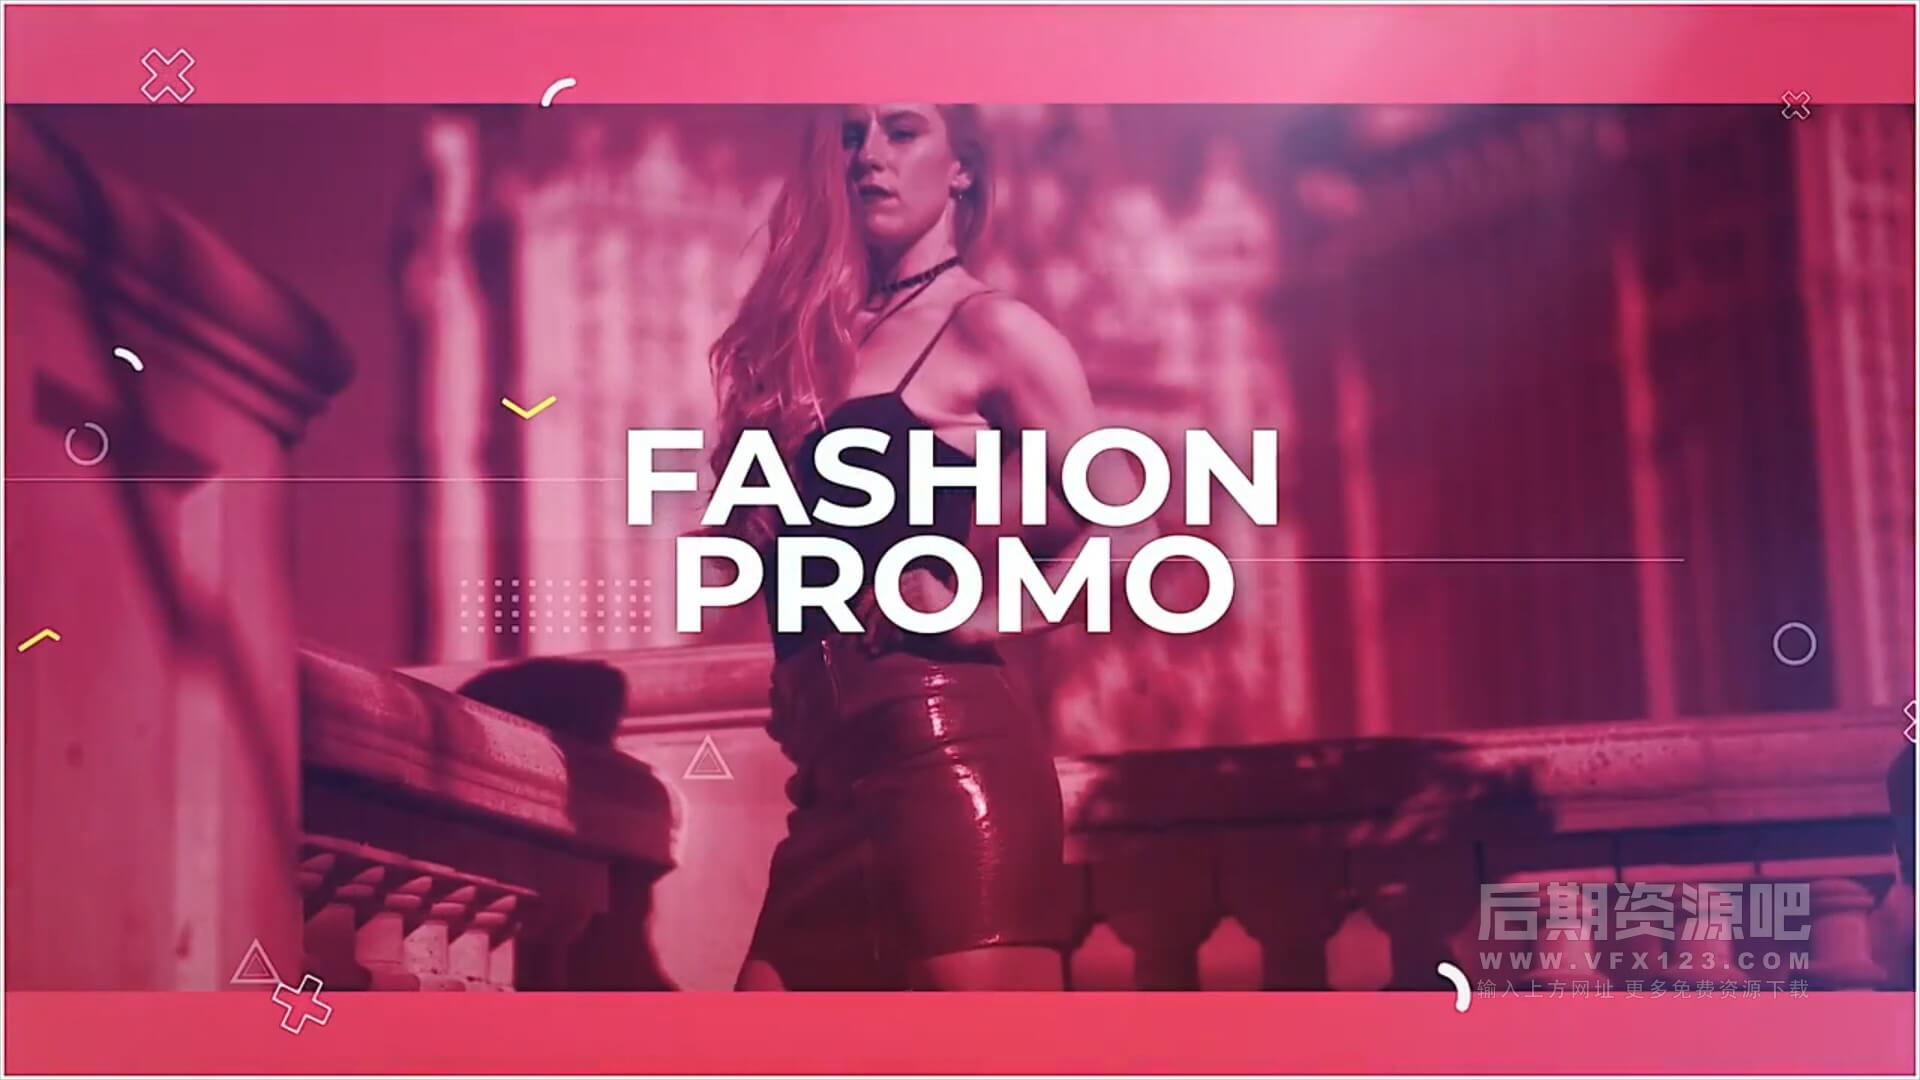 fcpx插件 炫酷时尚写真个人展示主题模板 含12分镜 The Fashion